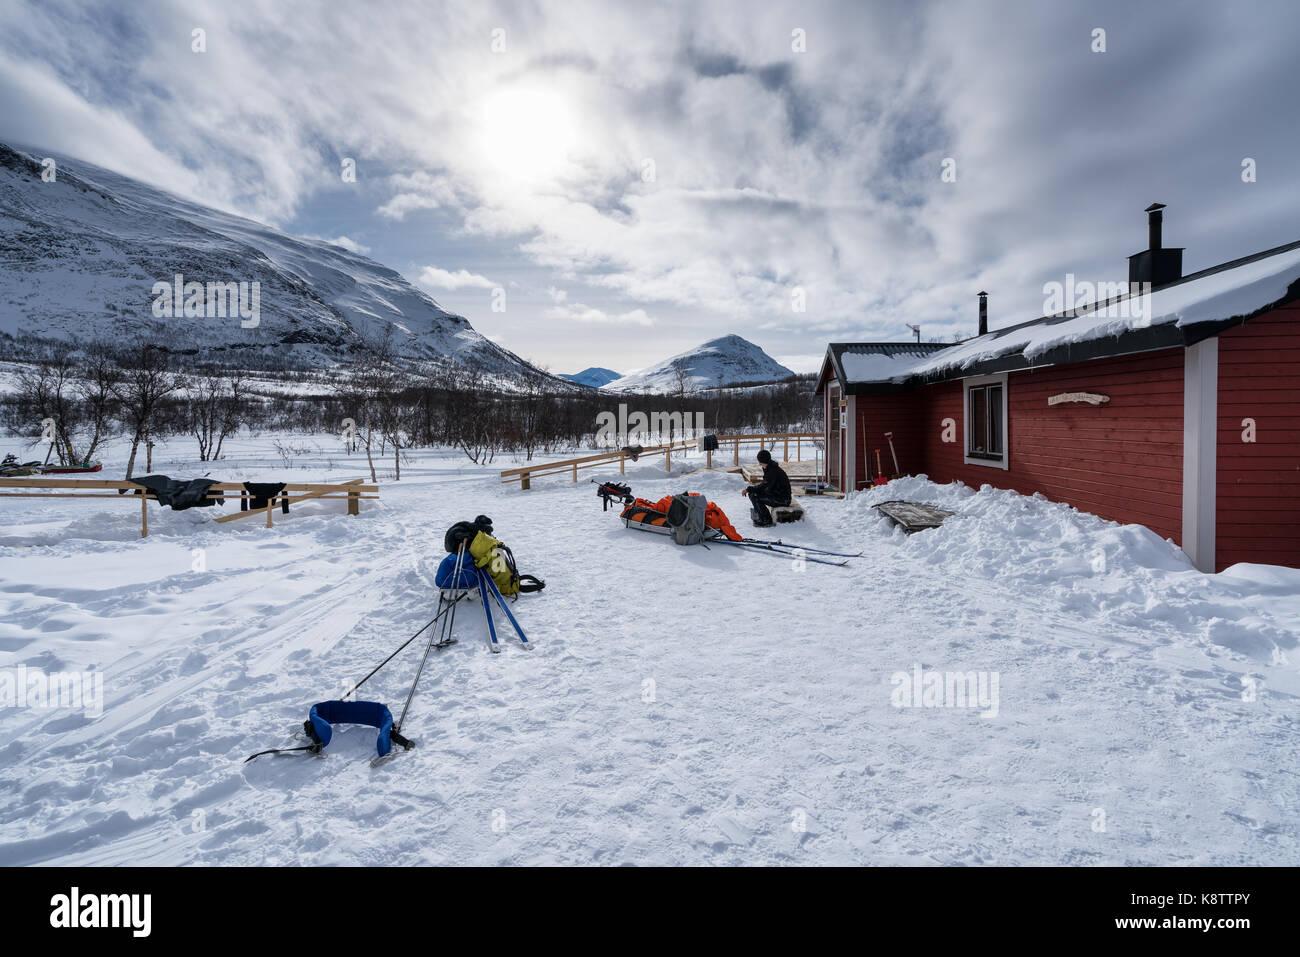 Ski touring in the Abisko national park, Sweden, Europe - Stock Image